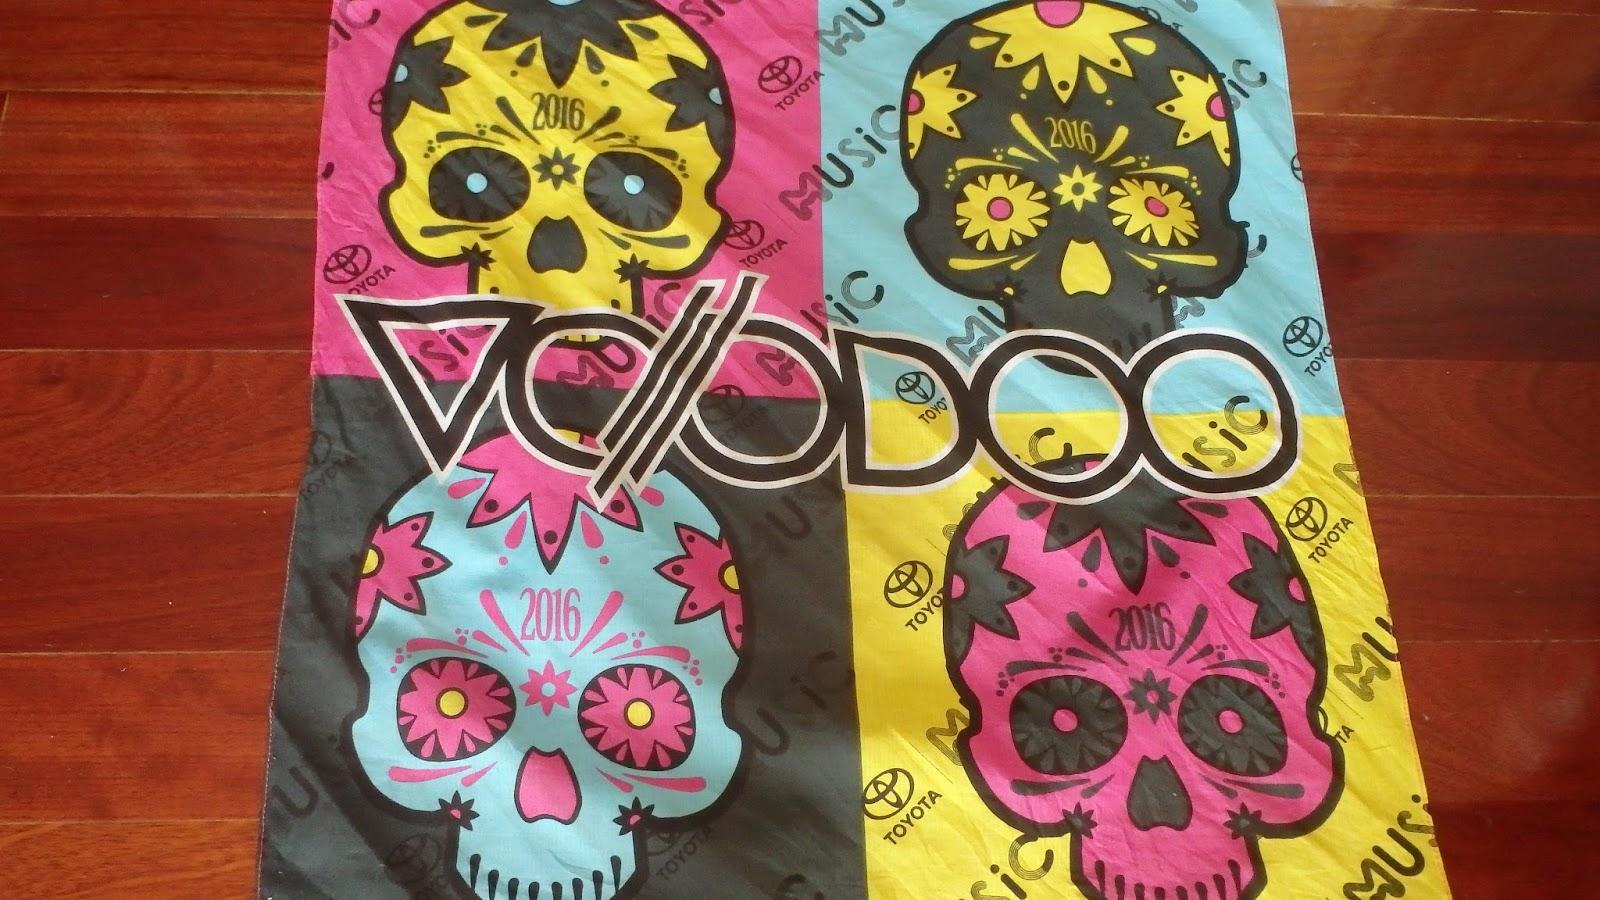 Voodoo Fest 2016 bandanna